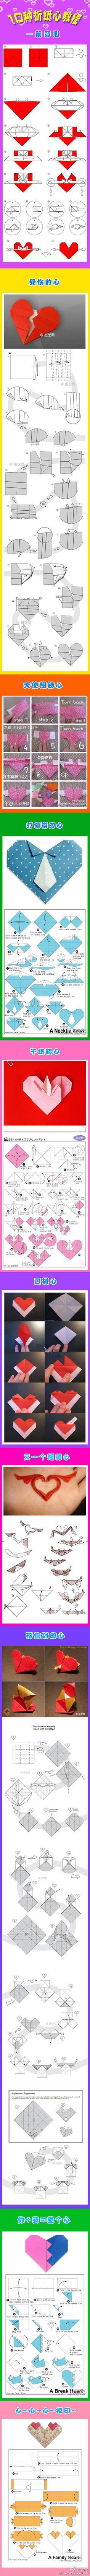 10 origami heart tutorials